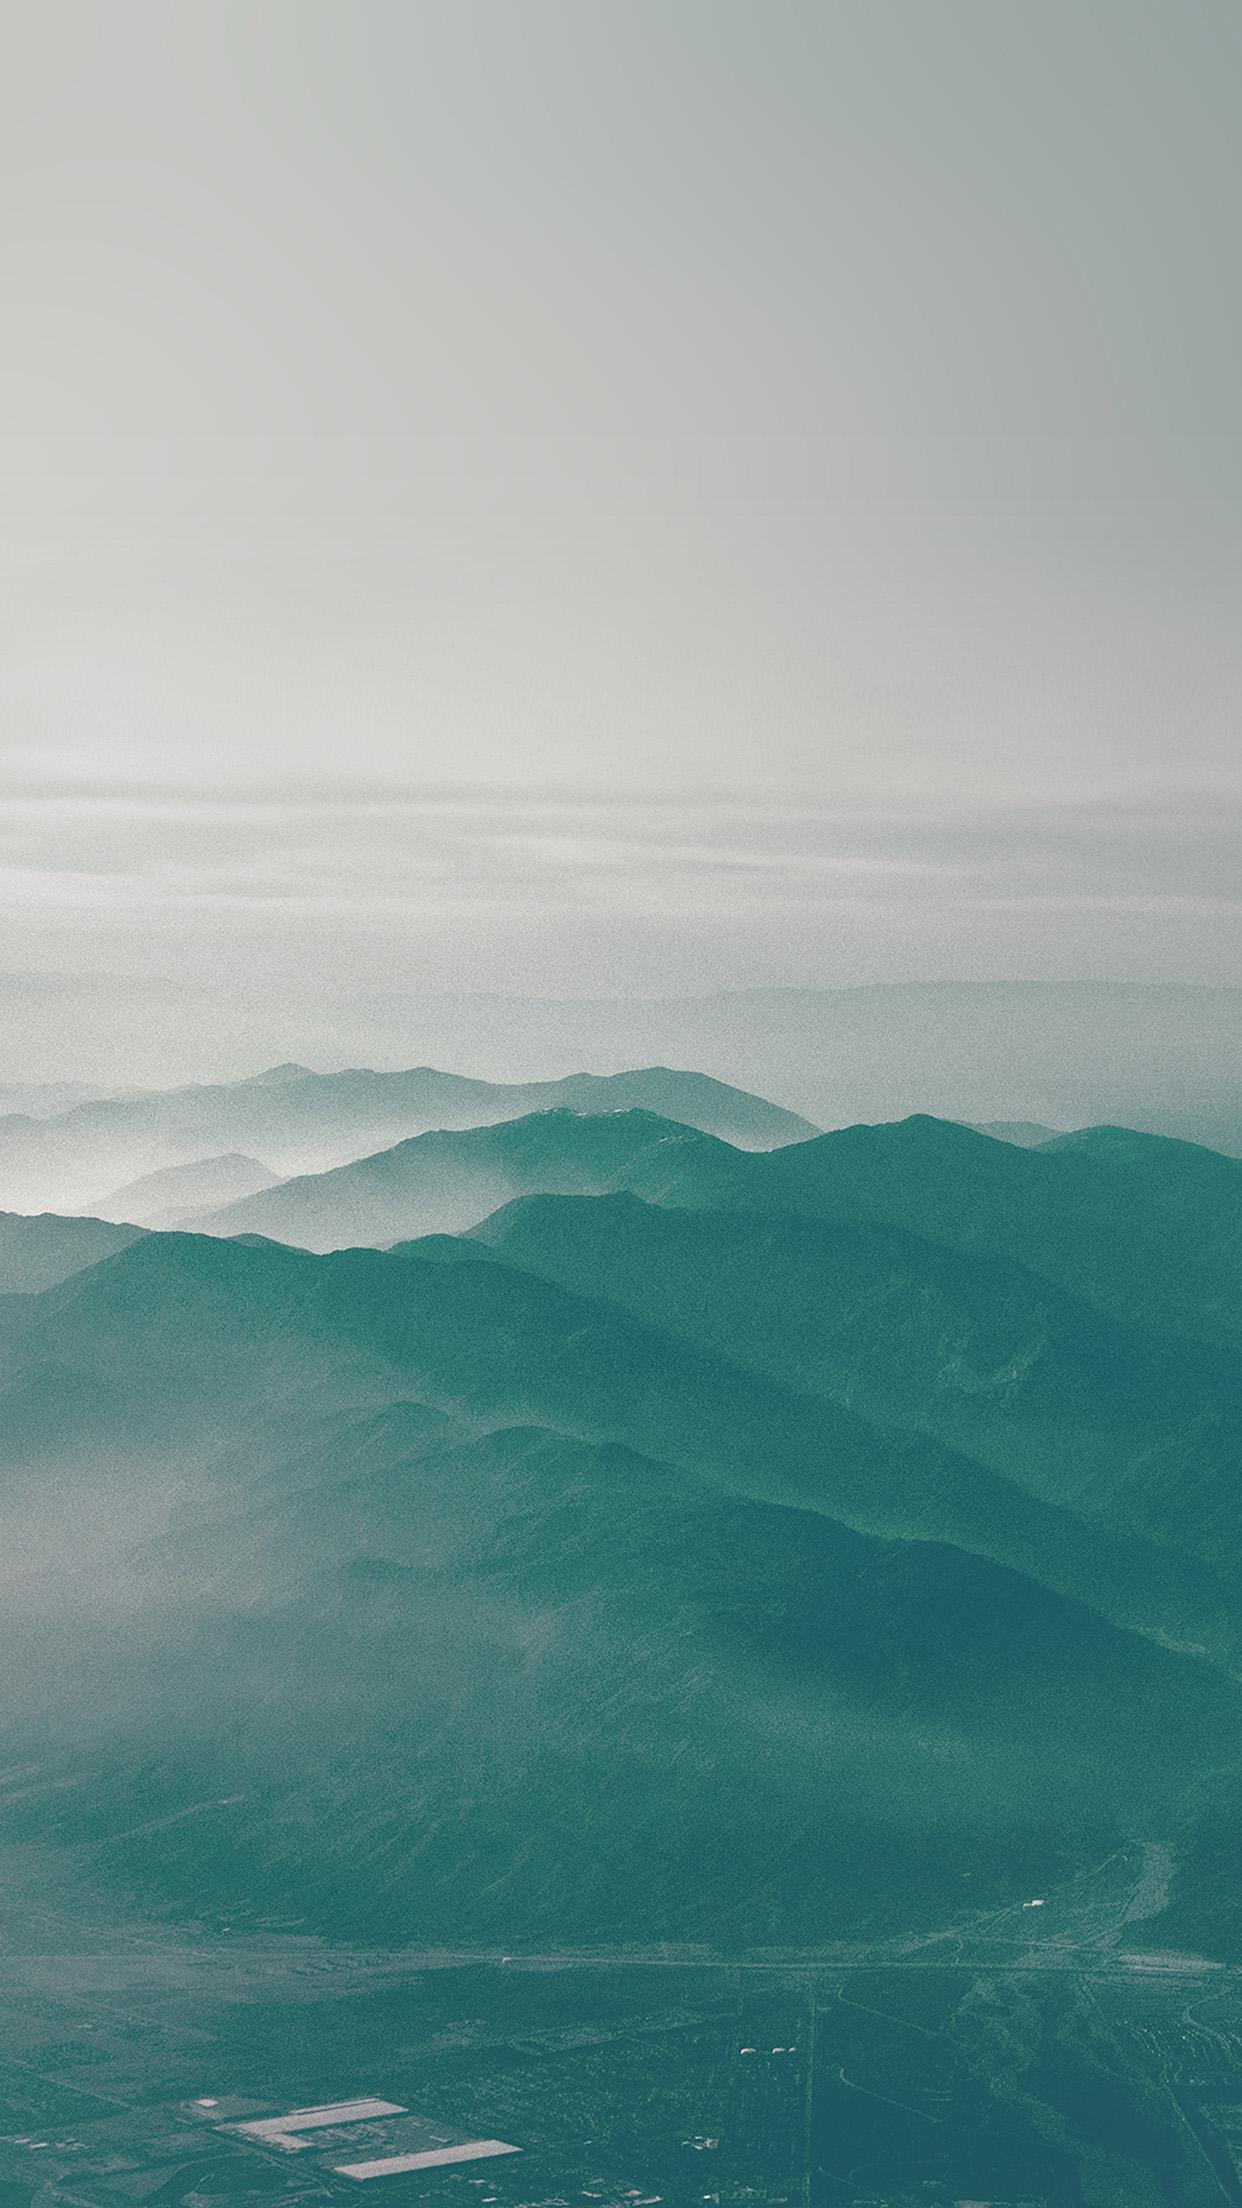 Simple Wallpaper Mountain Fog - Mountain-Fog-Nature-Green-Flare-Sky-View  Image_798710.jpg